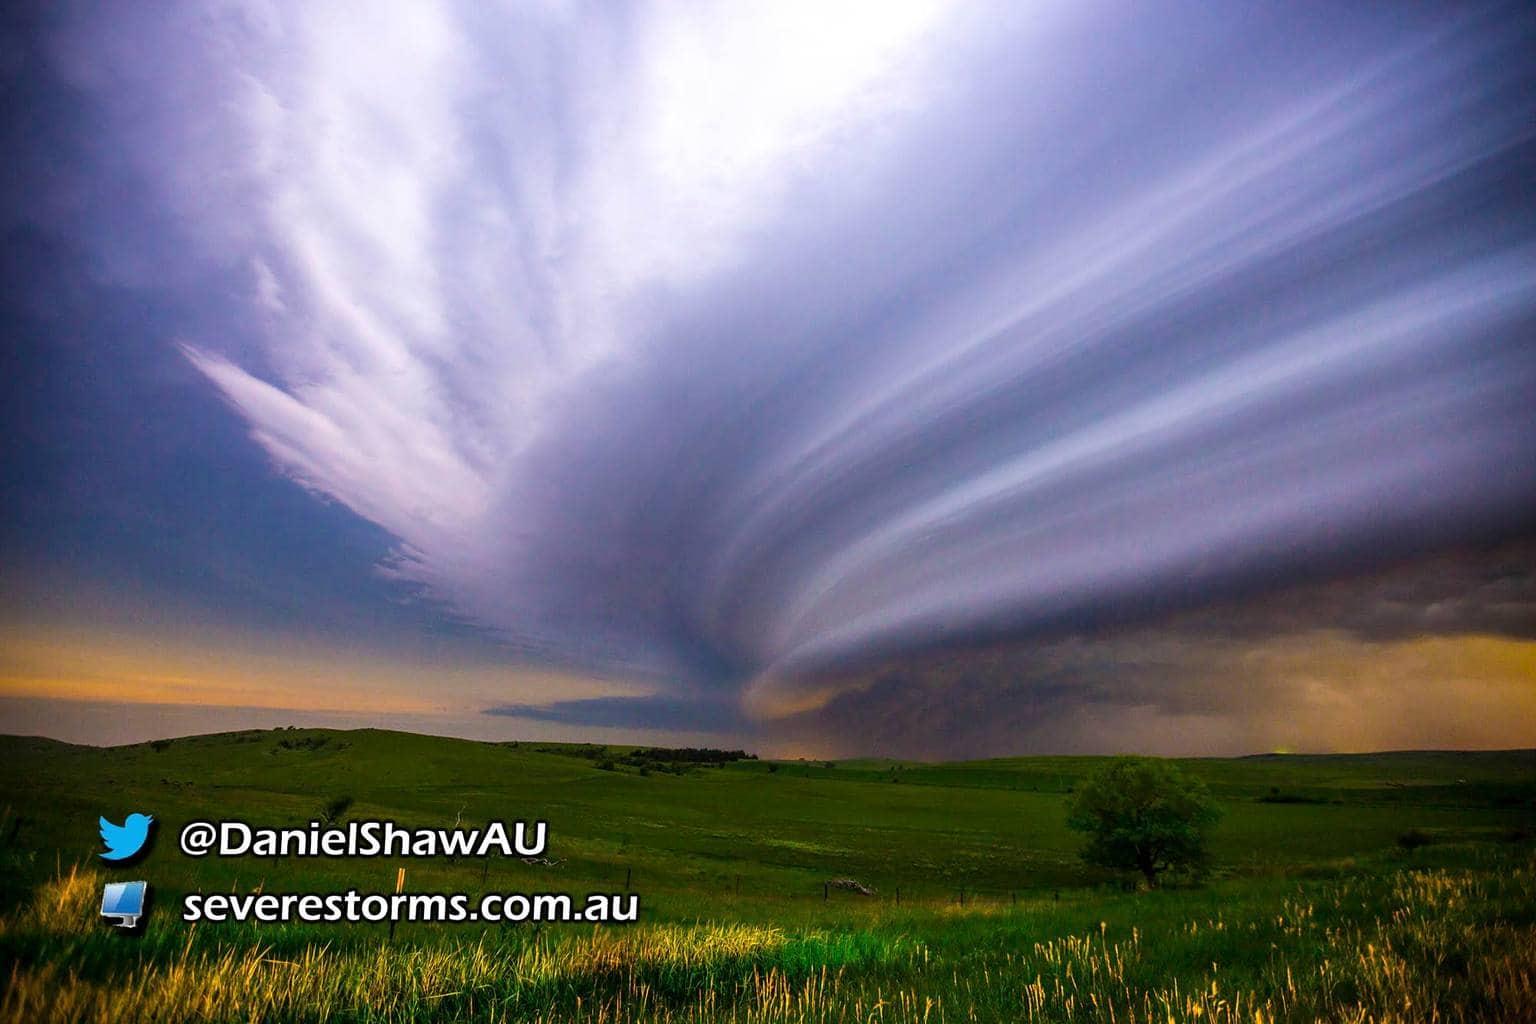 12.30am, Near Broken Bow, Nebraska. A severe storm lights up the night sky, revealing the farmland below. Striated squall line dominates the frame.